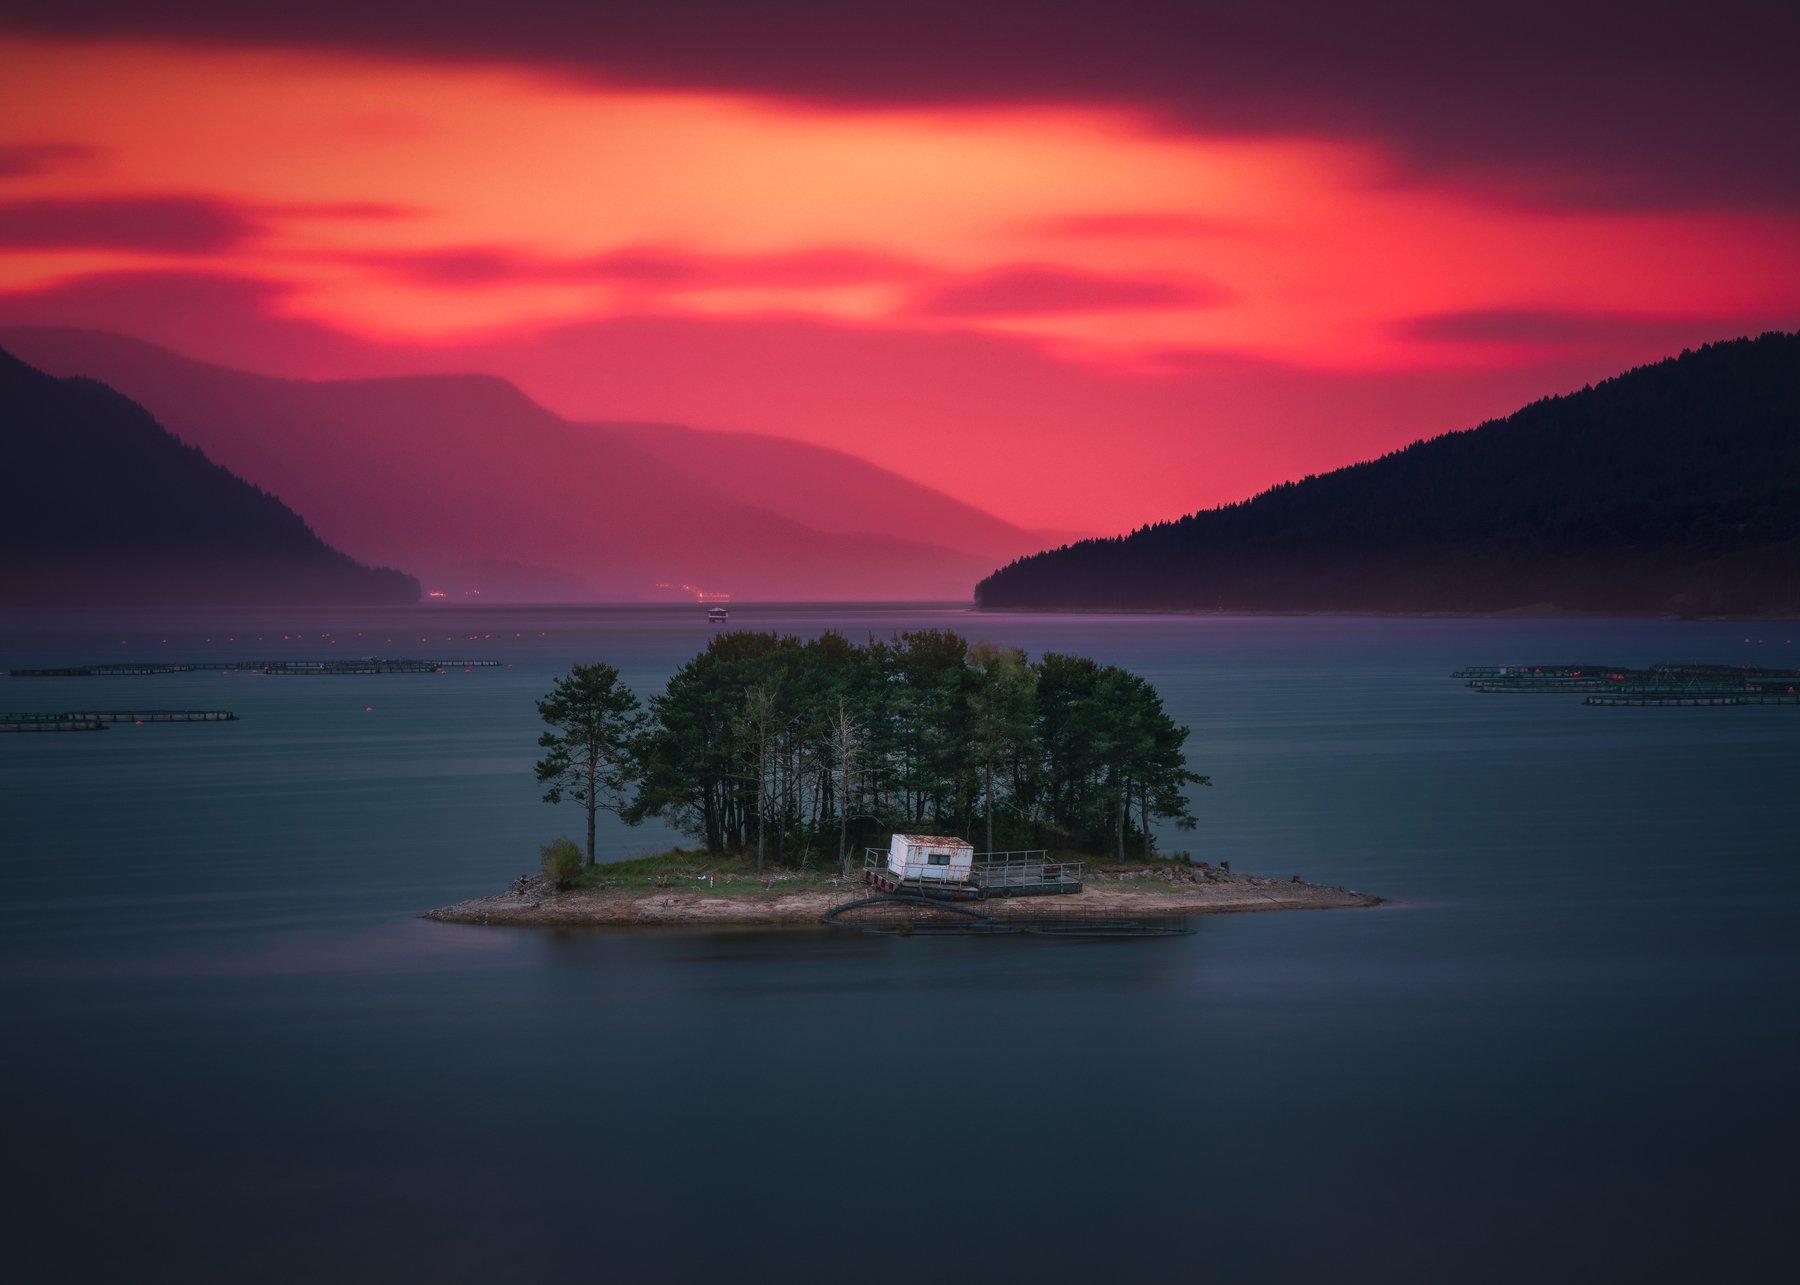 bulgaria, island , Radoslav Sviretsov